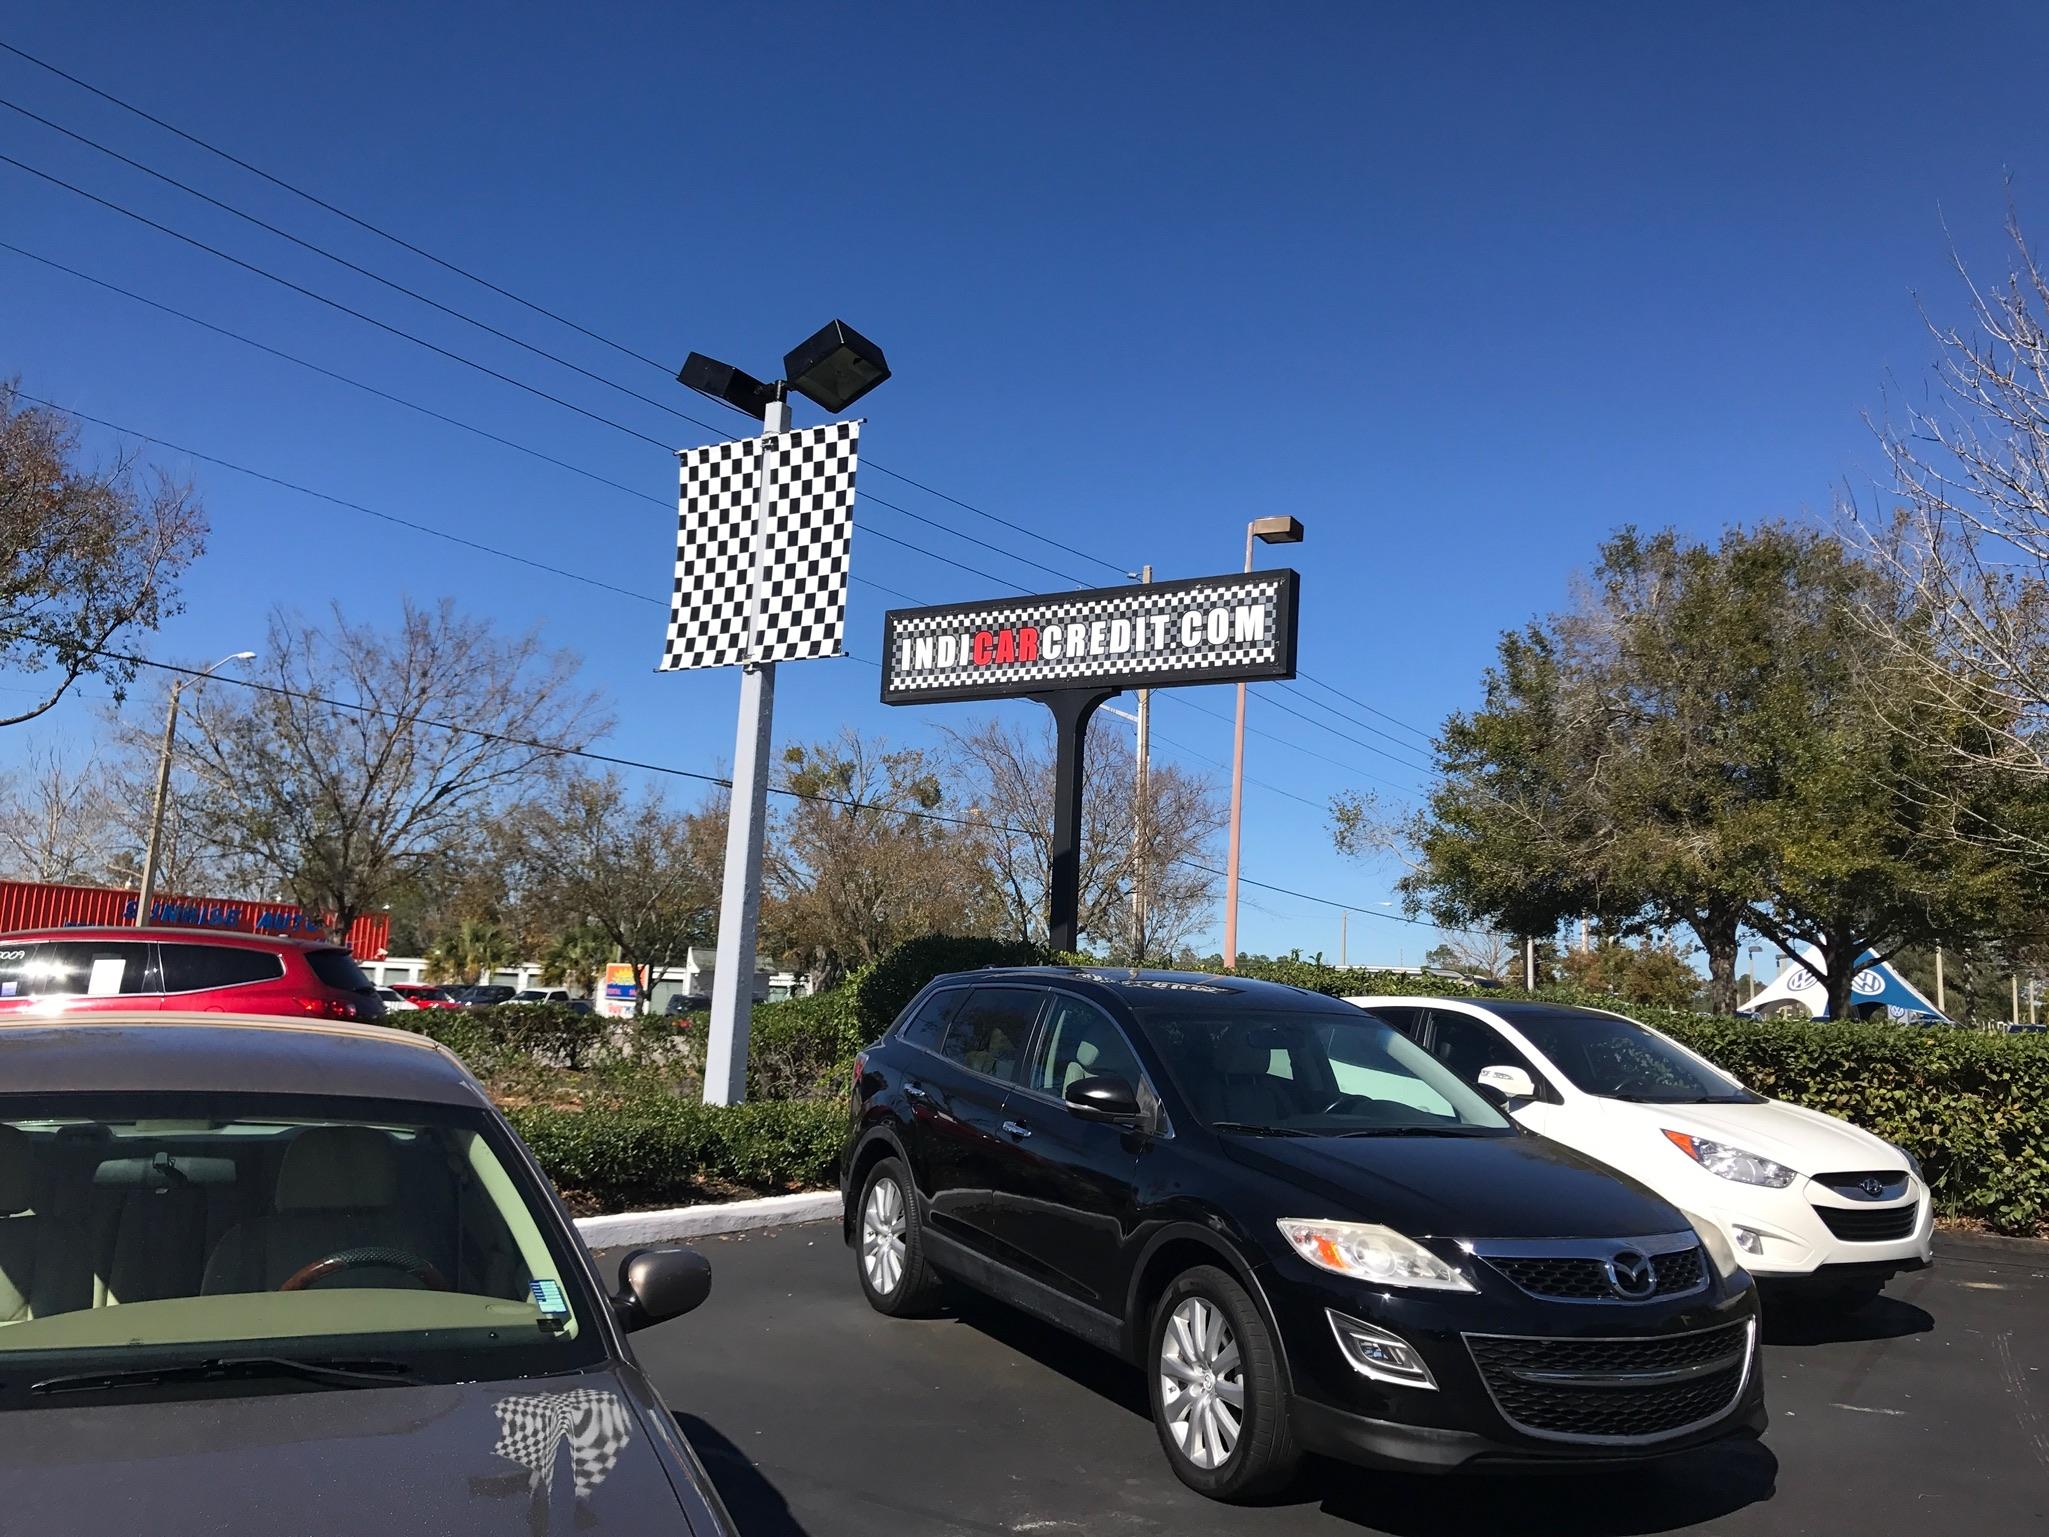 Indi car credit in gainesville fl 32609 for Tomlinson motors gainesville florida